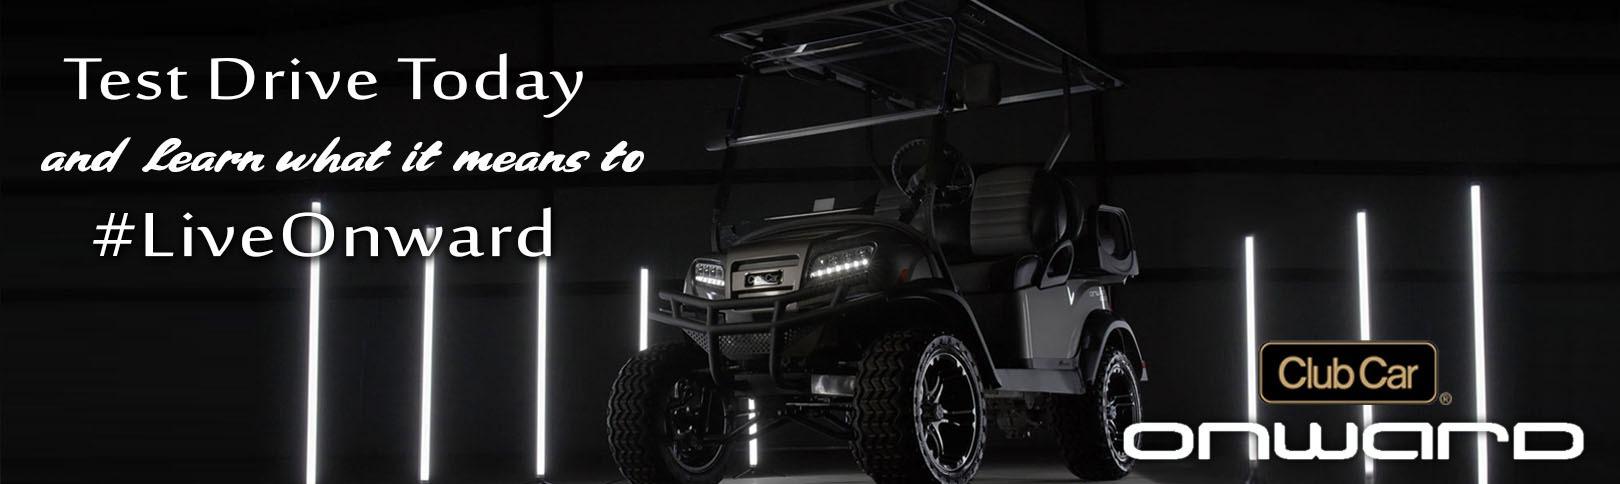 Test Drive Banner